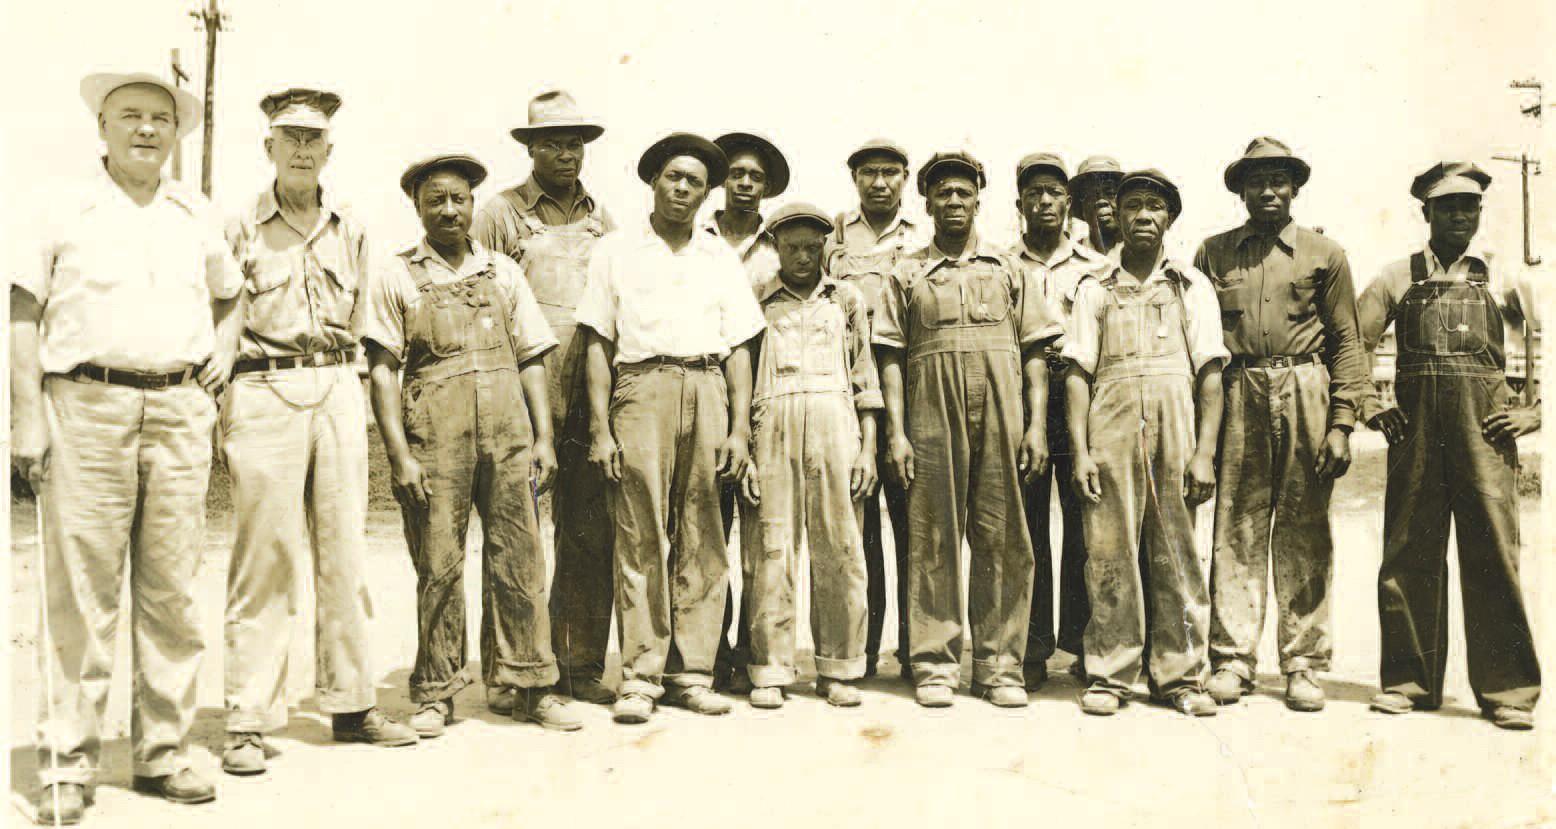 Foreman Frank Black, far left, and his crew kept the bridges in good repair for the railroad. Courtesy of Doris Blessington Eastside